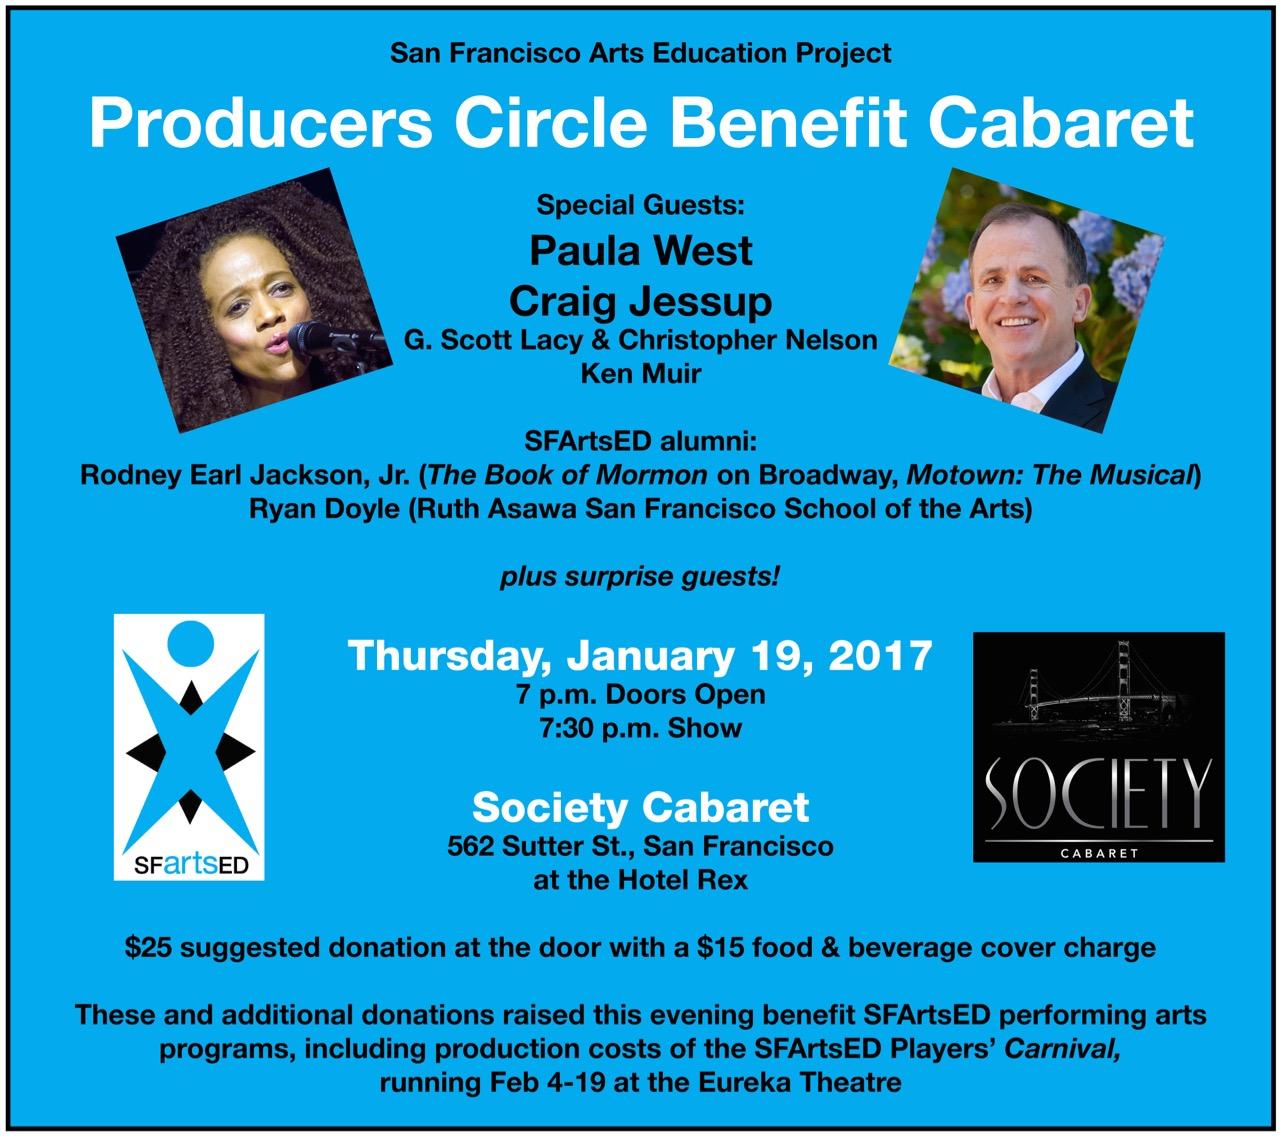 Benefit Cabaret on Jan. 19